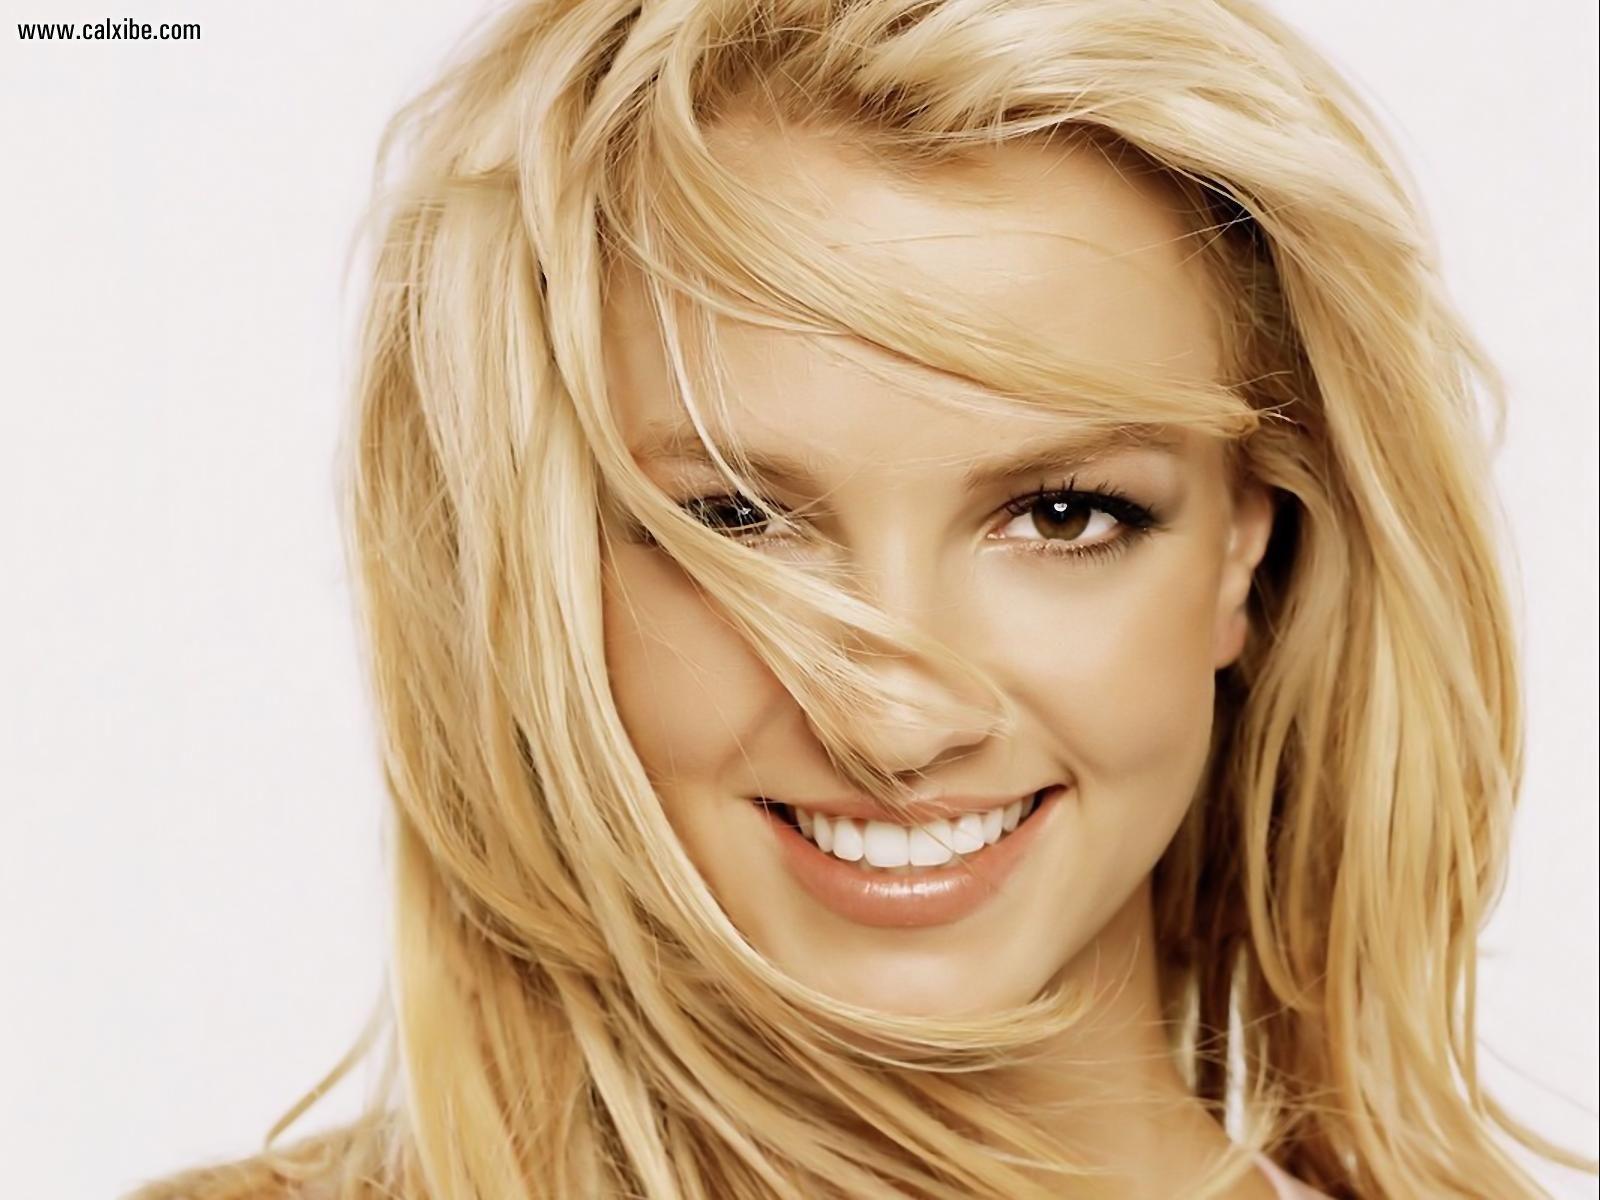 http://1.bp.blogspot.com/-judhcNN7TZk/Ttp01WGKeTI/AAAAAAAAAqw/LvqagNolqWQ/s1600/BritneySpears130.jpg